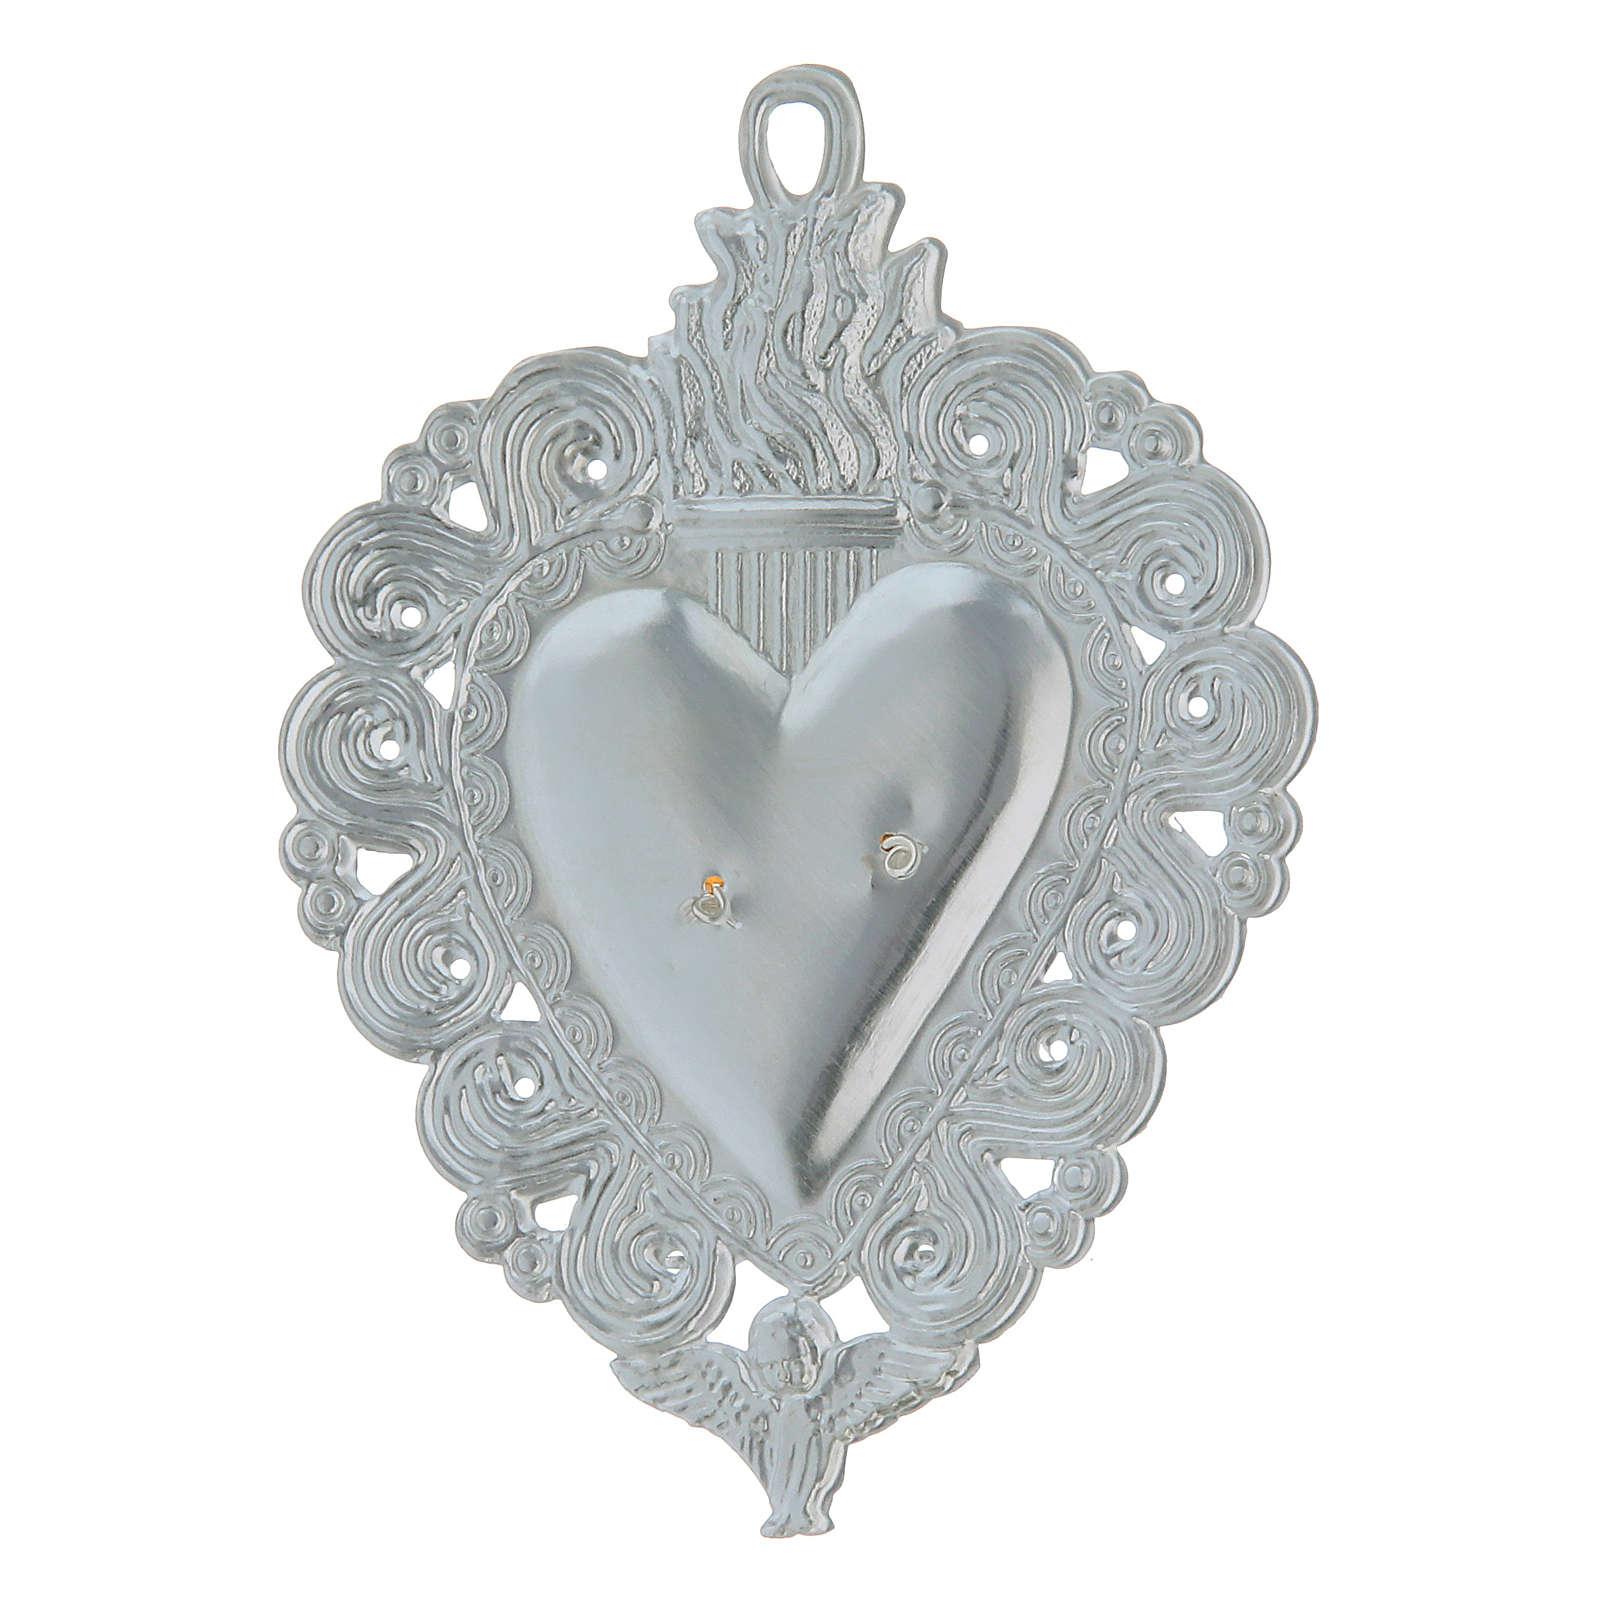 Ex-voto, Votive heart with angel 9.5x7.5cm 3